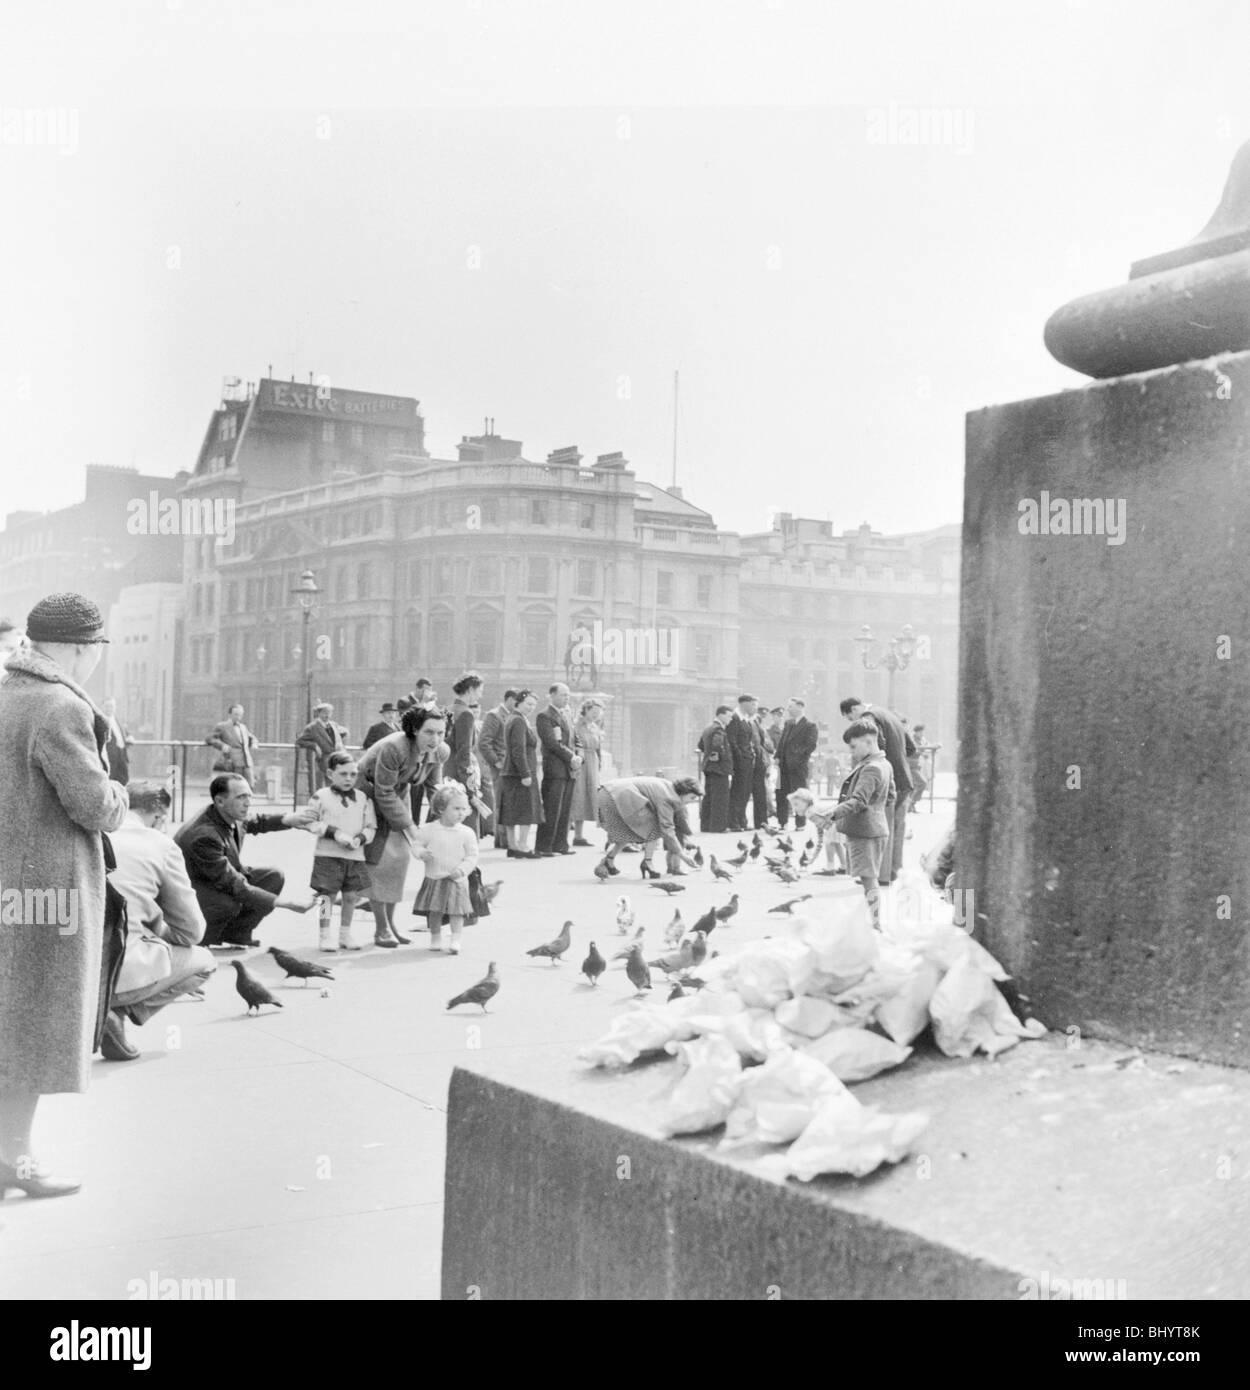 People feeding pigeons in Trafalgar Square, City of Westminster, London, c1950. Artist: Henry Grant - Stock Image